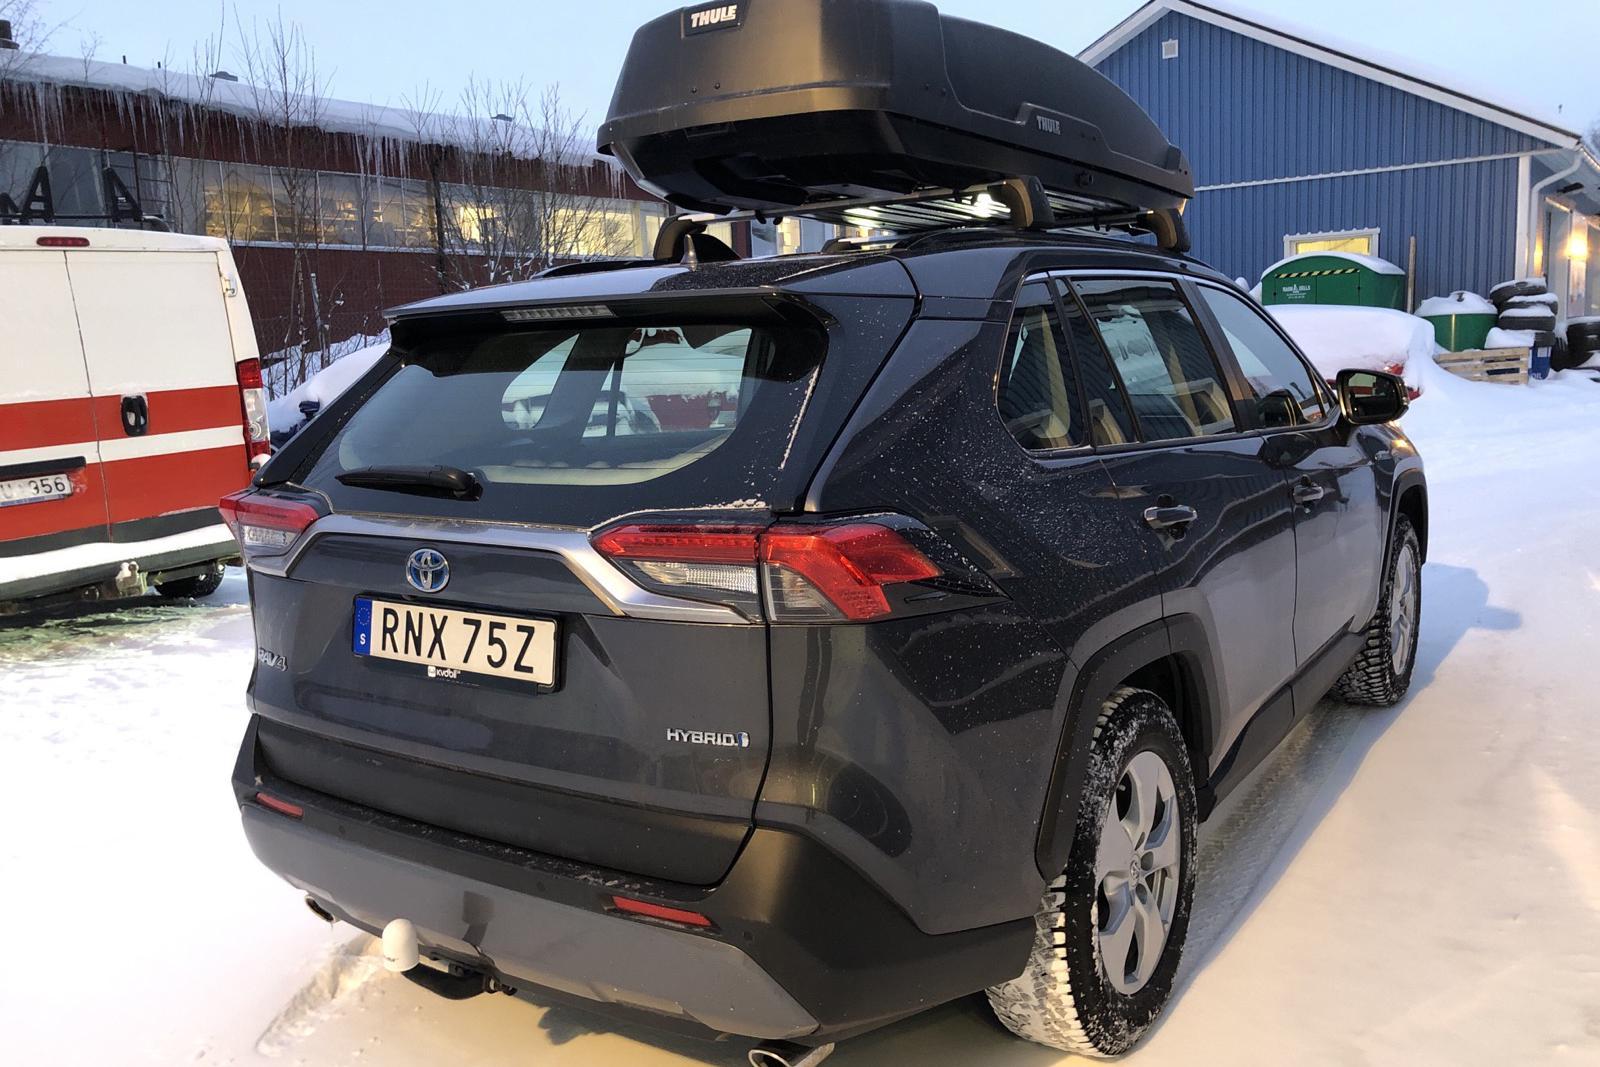 Toyota RAV4 2.5 HSD AWD (222hk) - 52 220 km - Automatic - Dark Grey - 2019